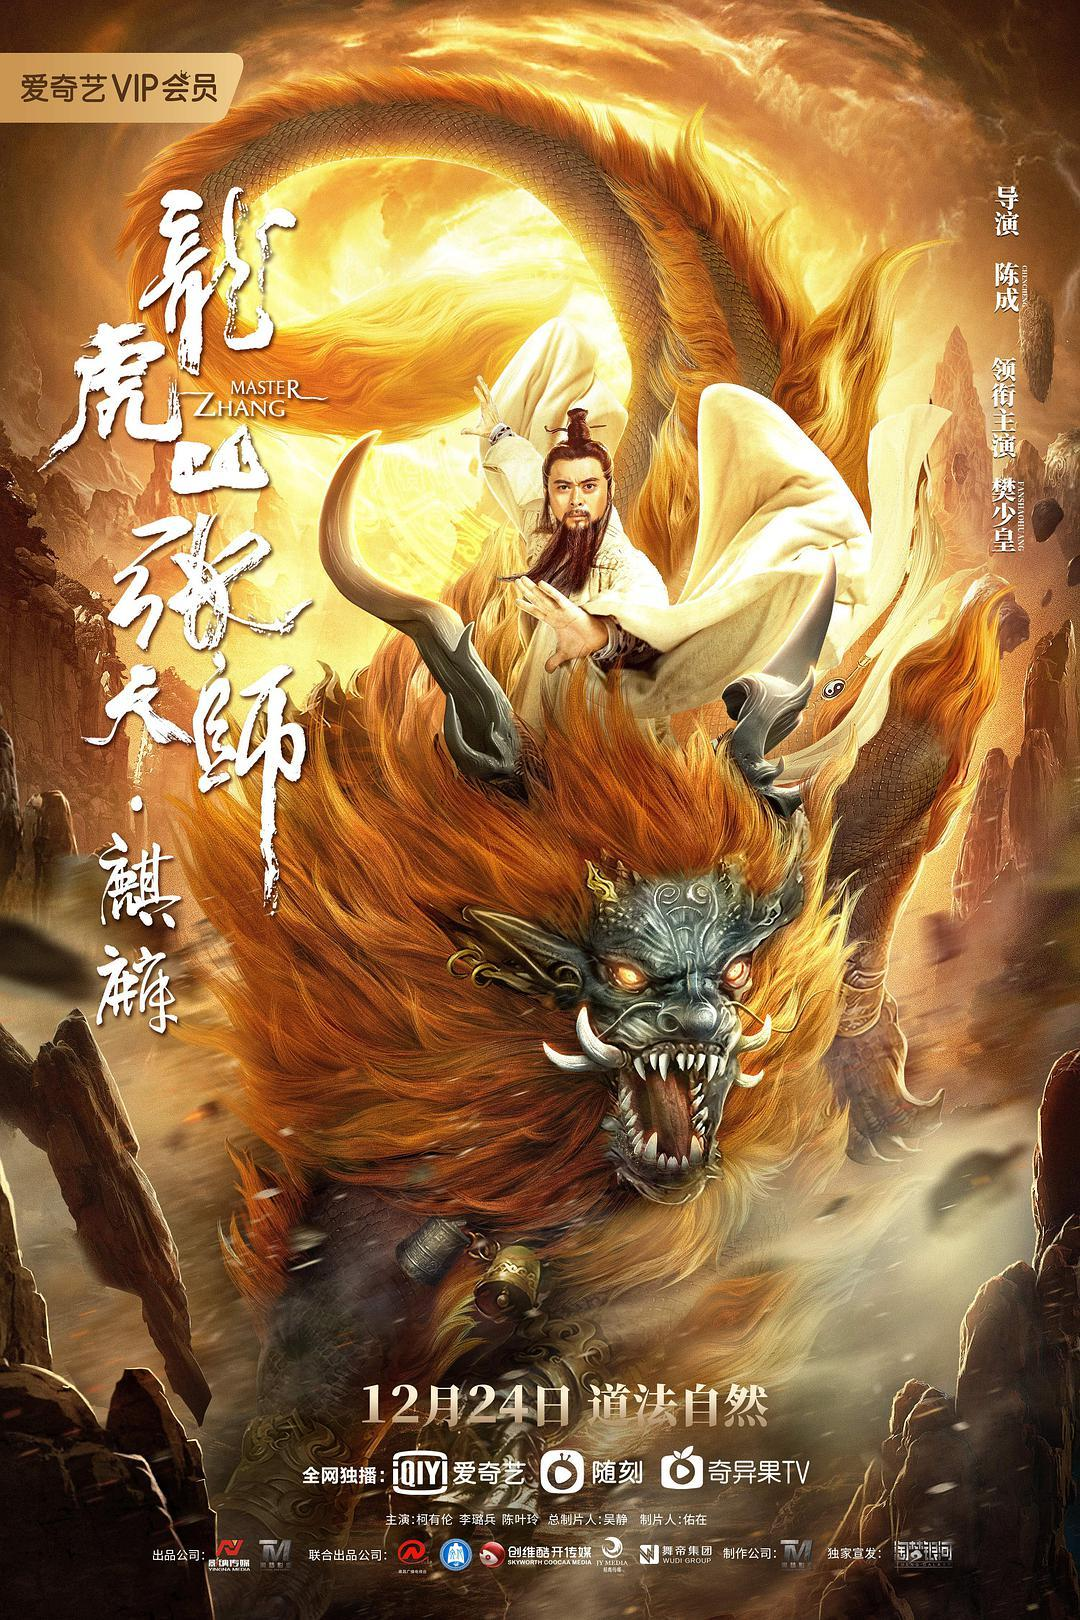 How To Watch Taoist Master Online?